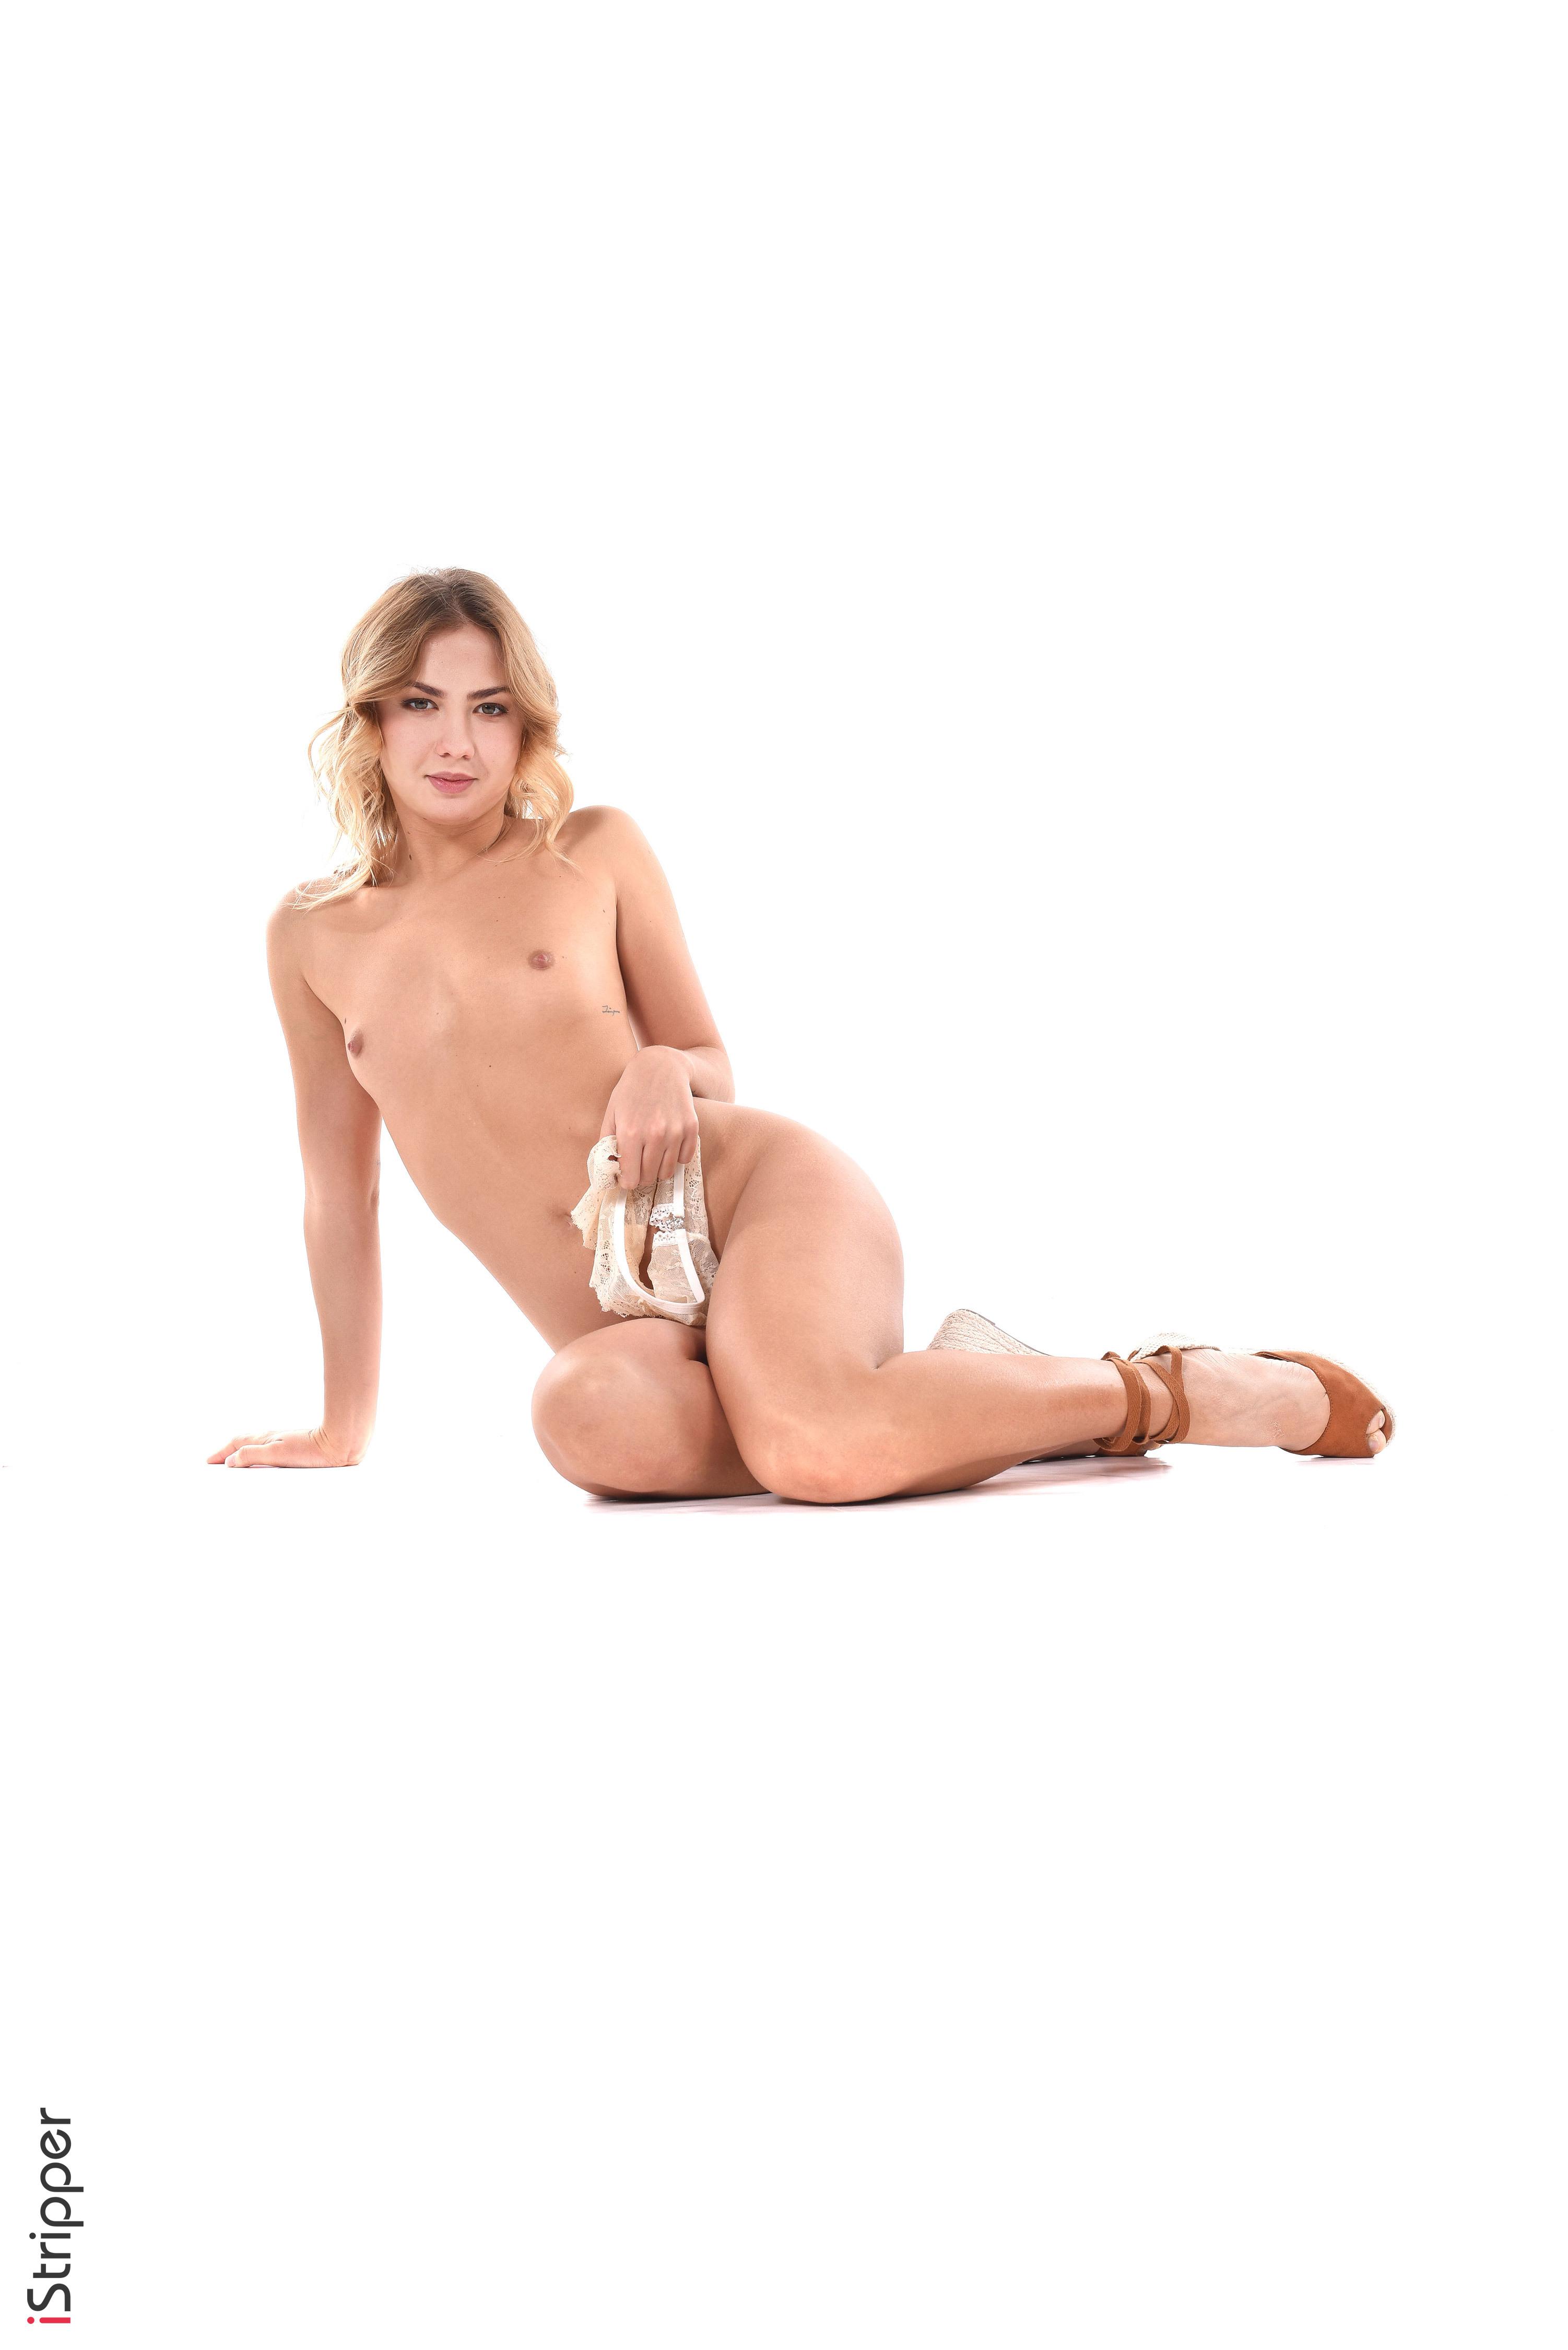 slim extoic hottie sexy webcam striptease